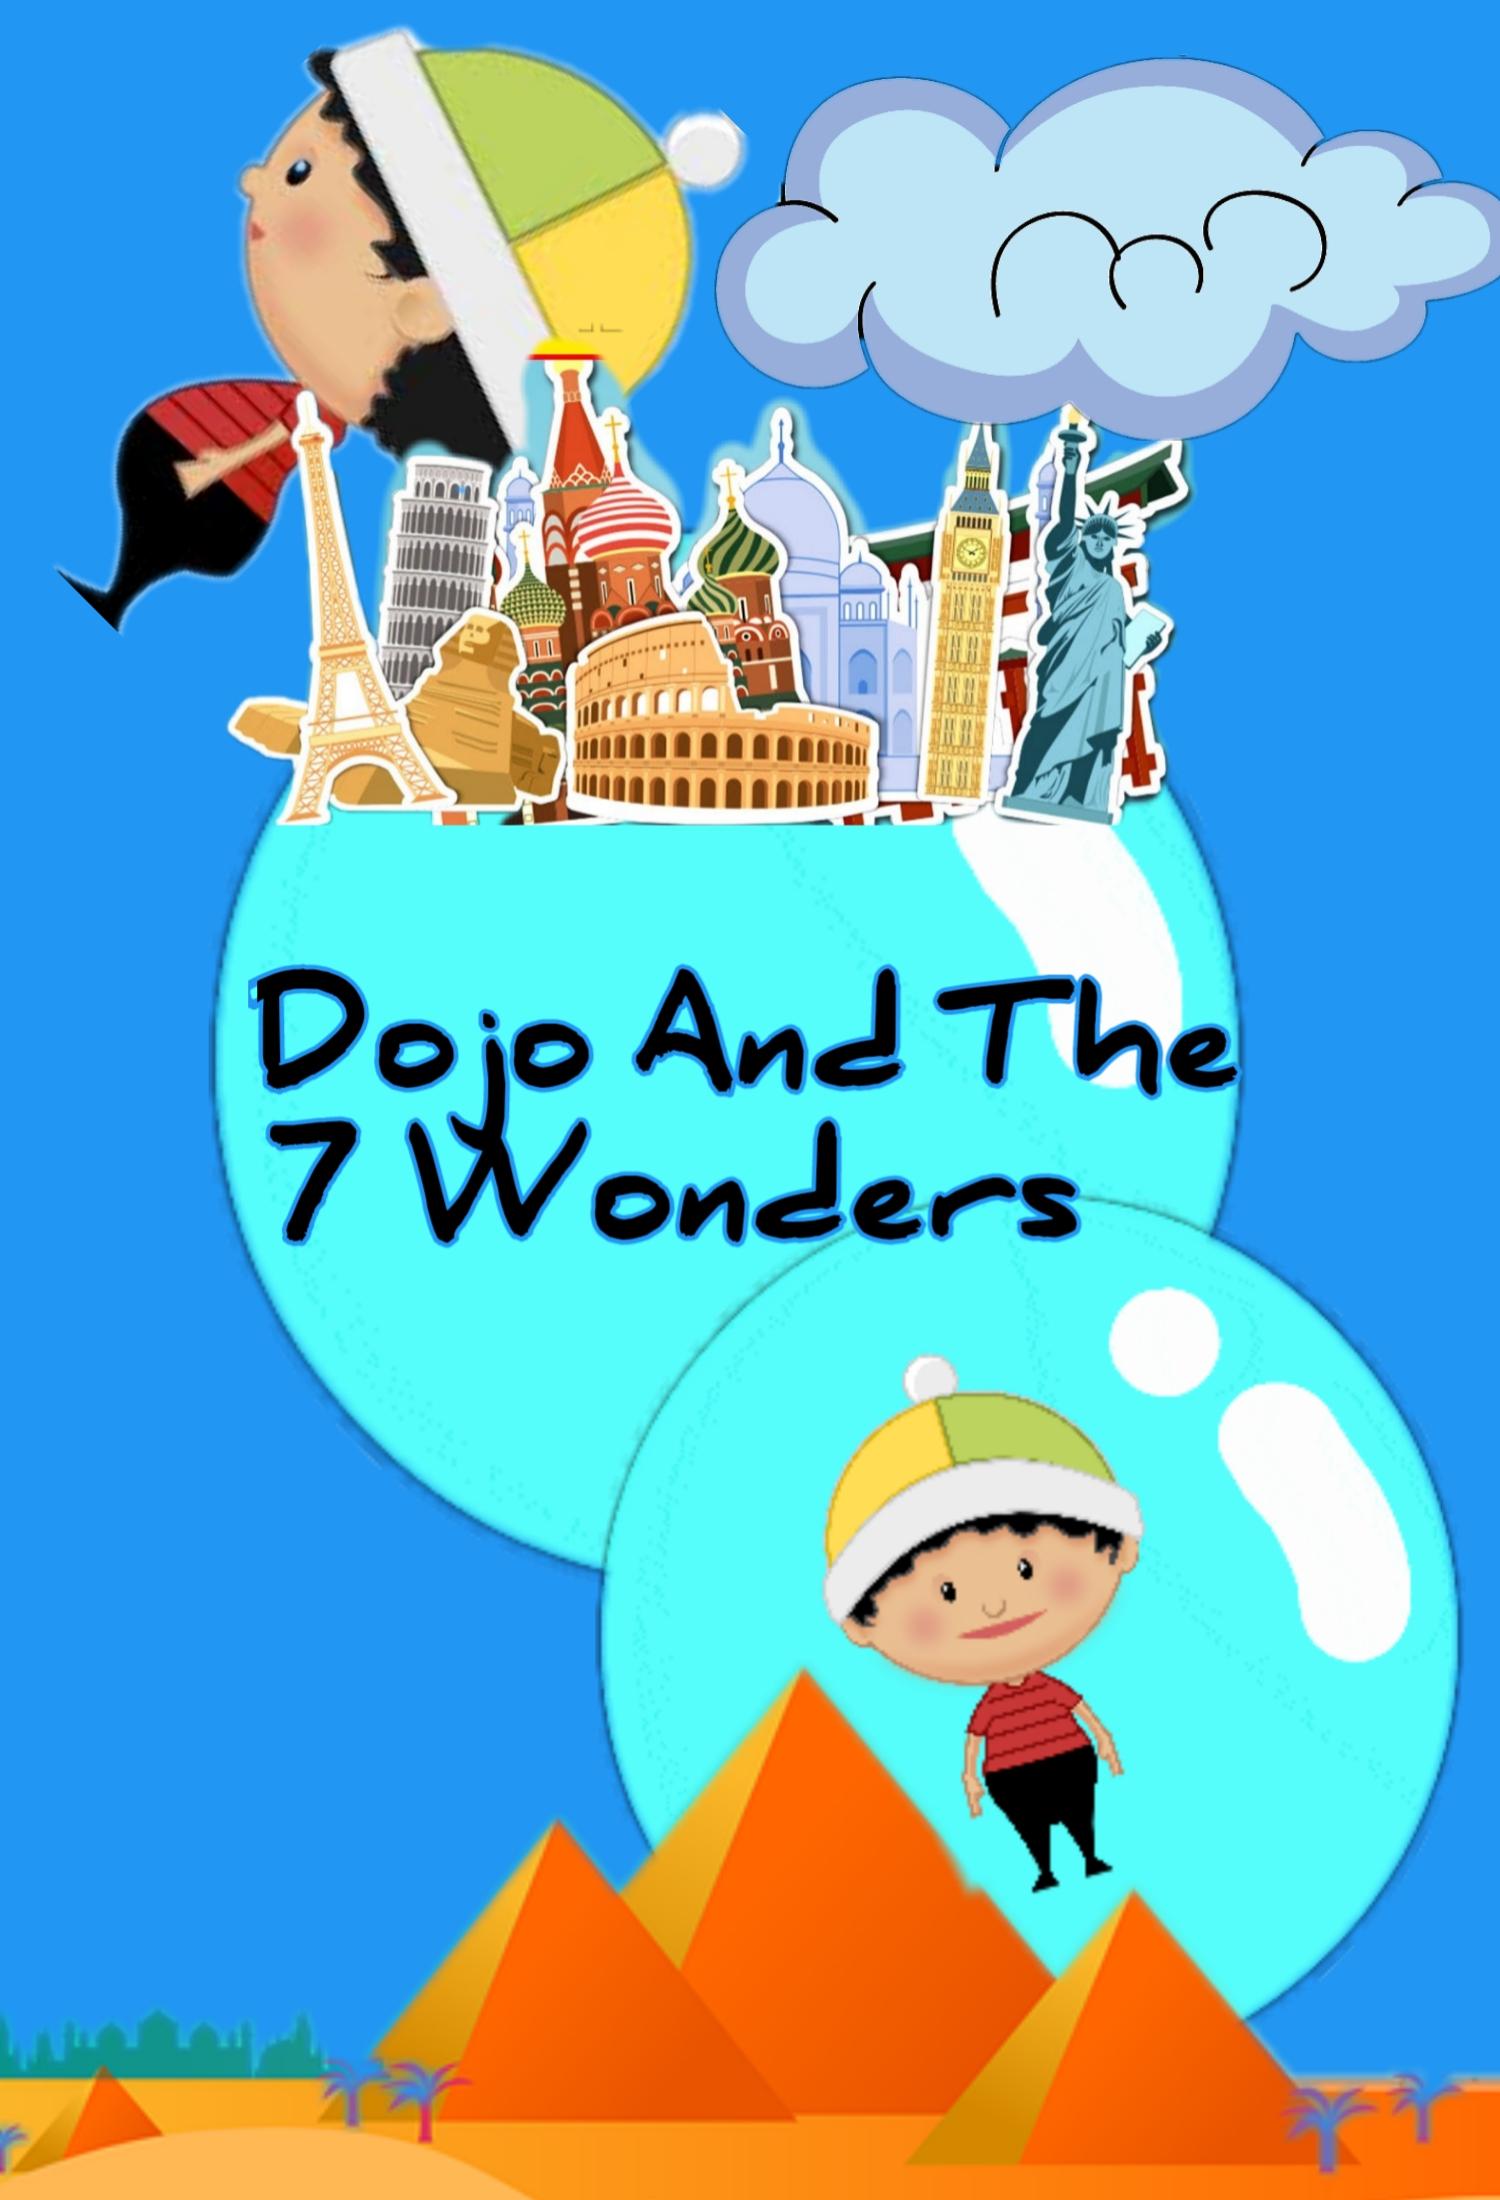 ड़ोजो और 7 अजुबें - Story For Kids in Hindi